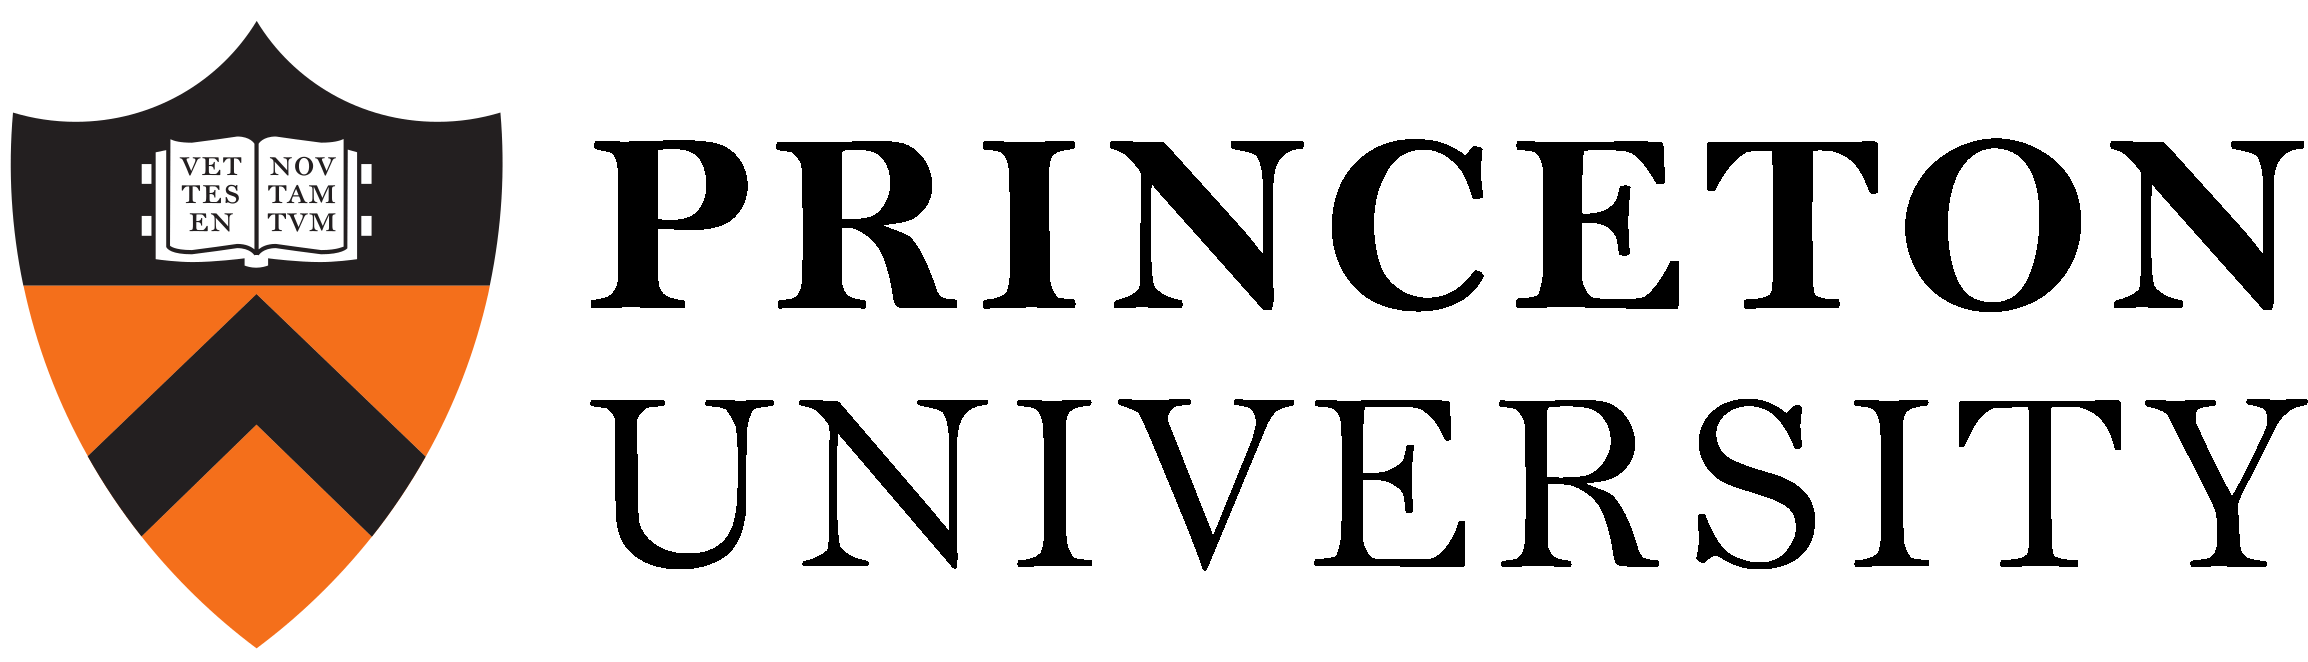 princeton logo color